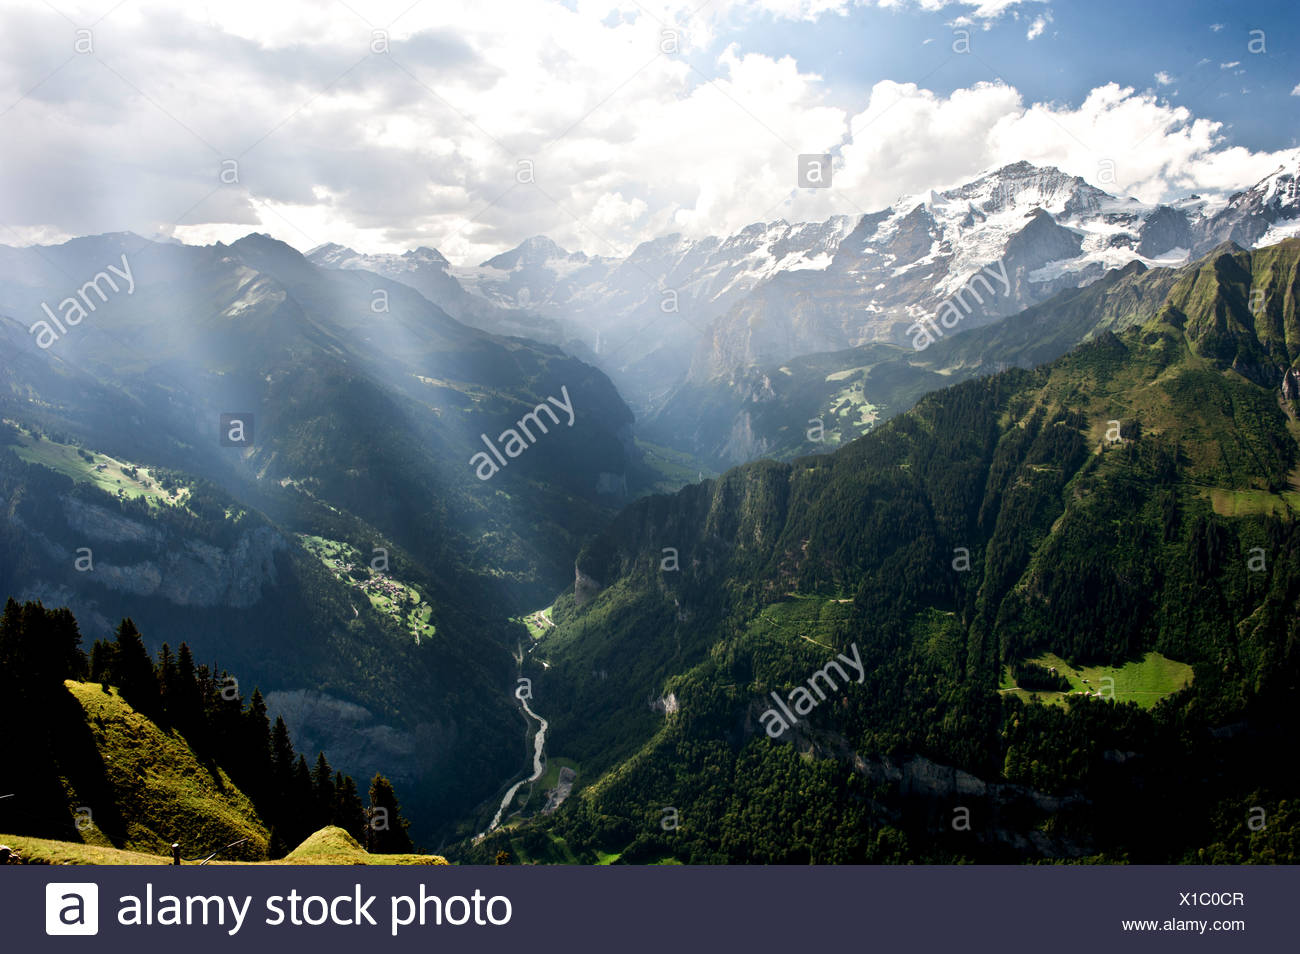 Alps, mountains, mountain scape, mountain scenery, Bernese Alps, High Alps, mountain chain, thunderstorm, autumn, fall, Jungfrau - Stock Image